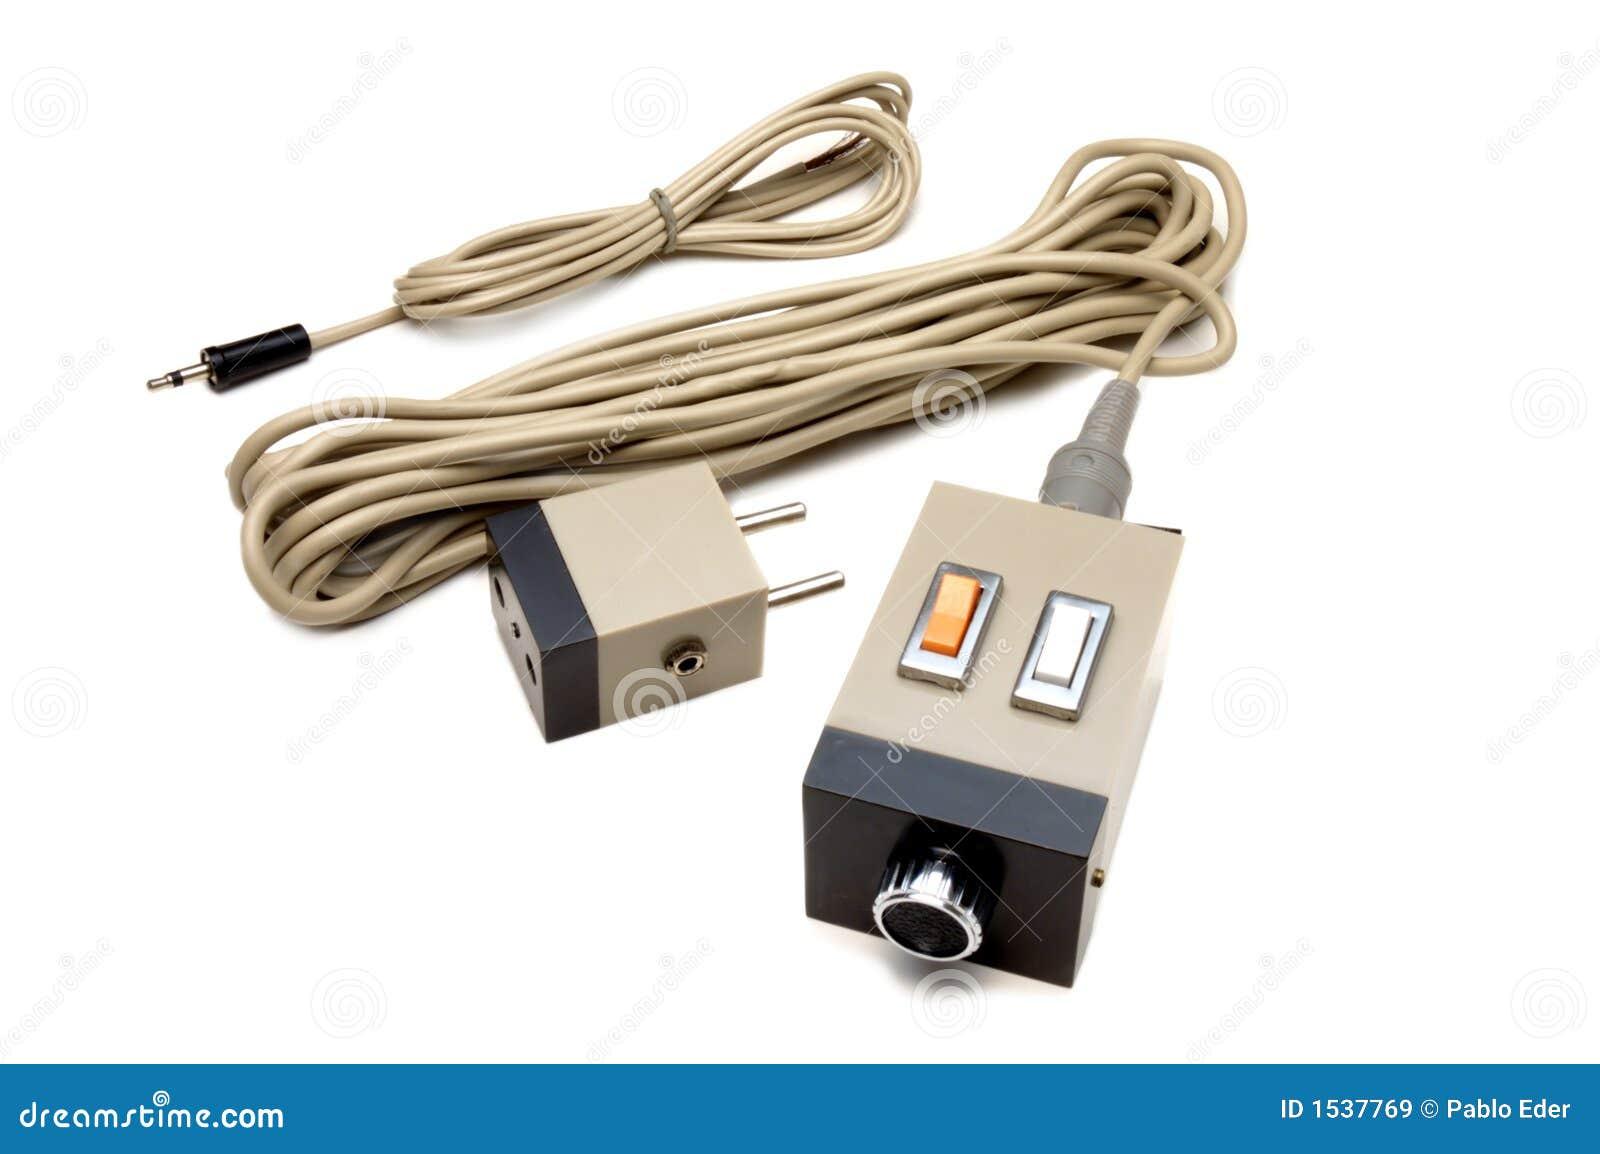 SKIM furthermore File UEF Bot Percival also 393145 81 Johnson 25hp Electric Start Convert Help furthermore 253621 Wiring Diagram Needed Hei Voltmeter Mercuiser 288 350 Sbc also Boat Diagram Mercury Motor Wiring. on commander remote start